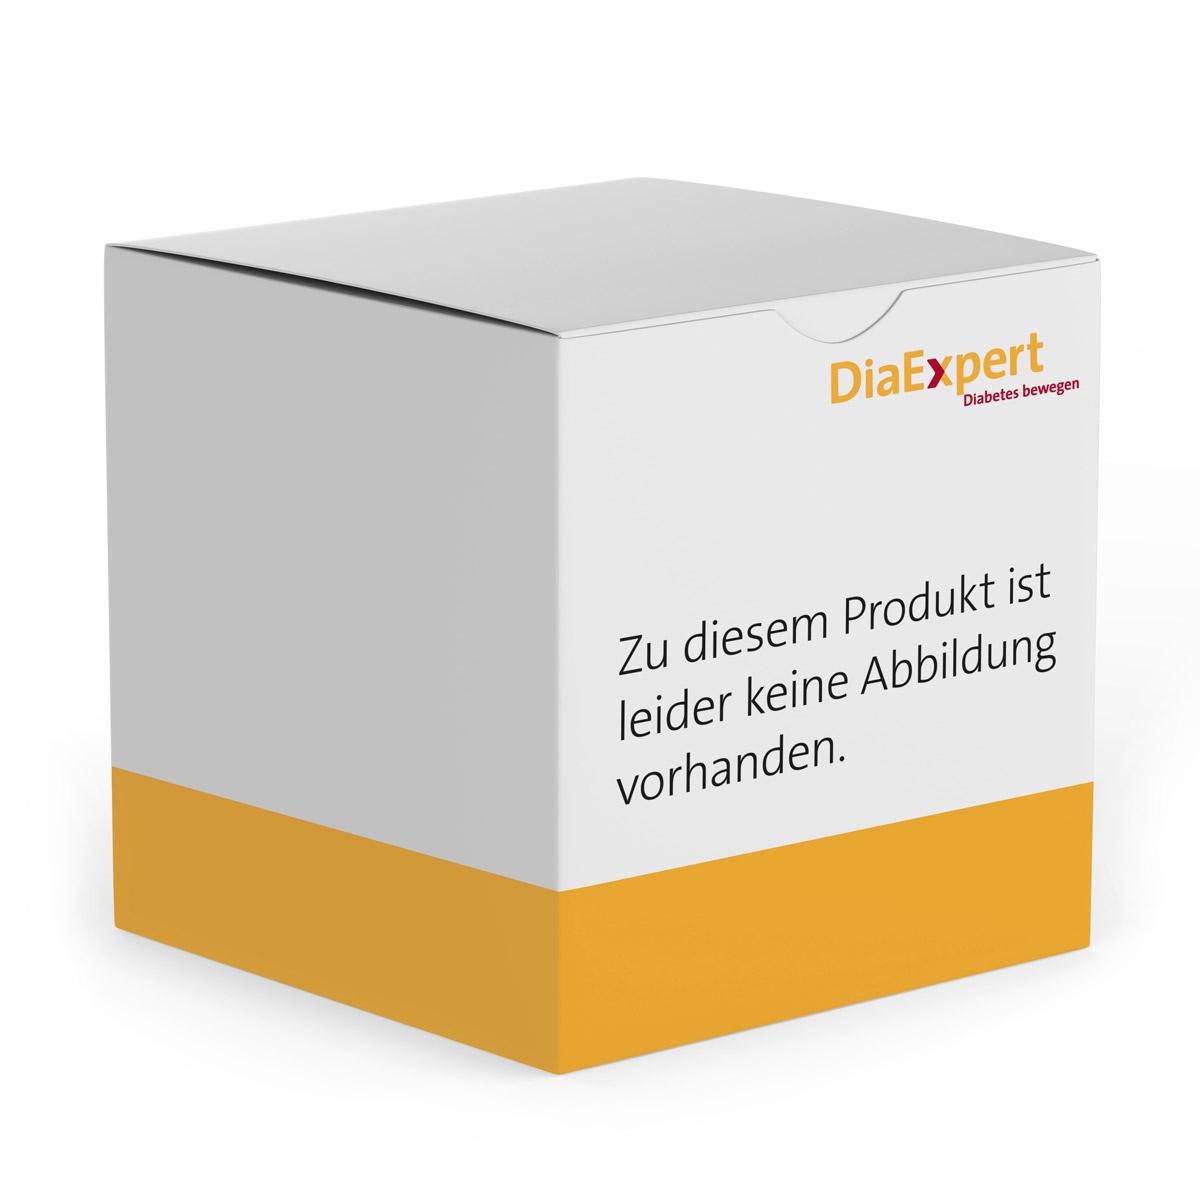 DiaExpert-Fachgeschäft Hamburg-Harburg